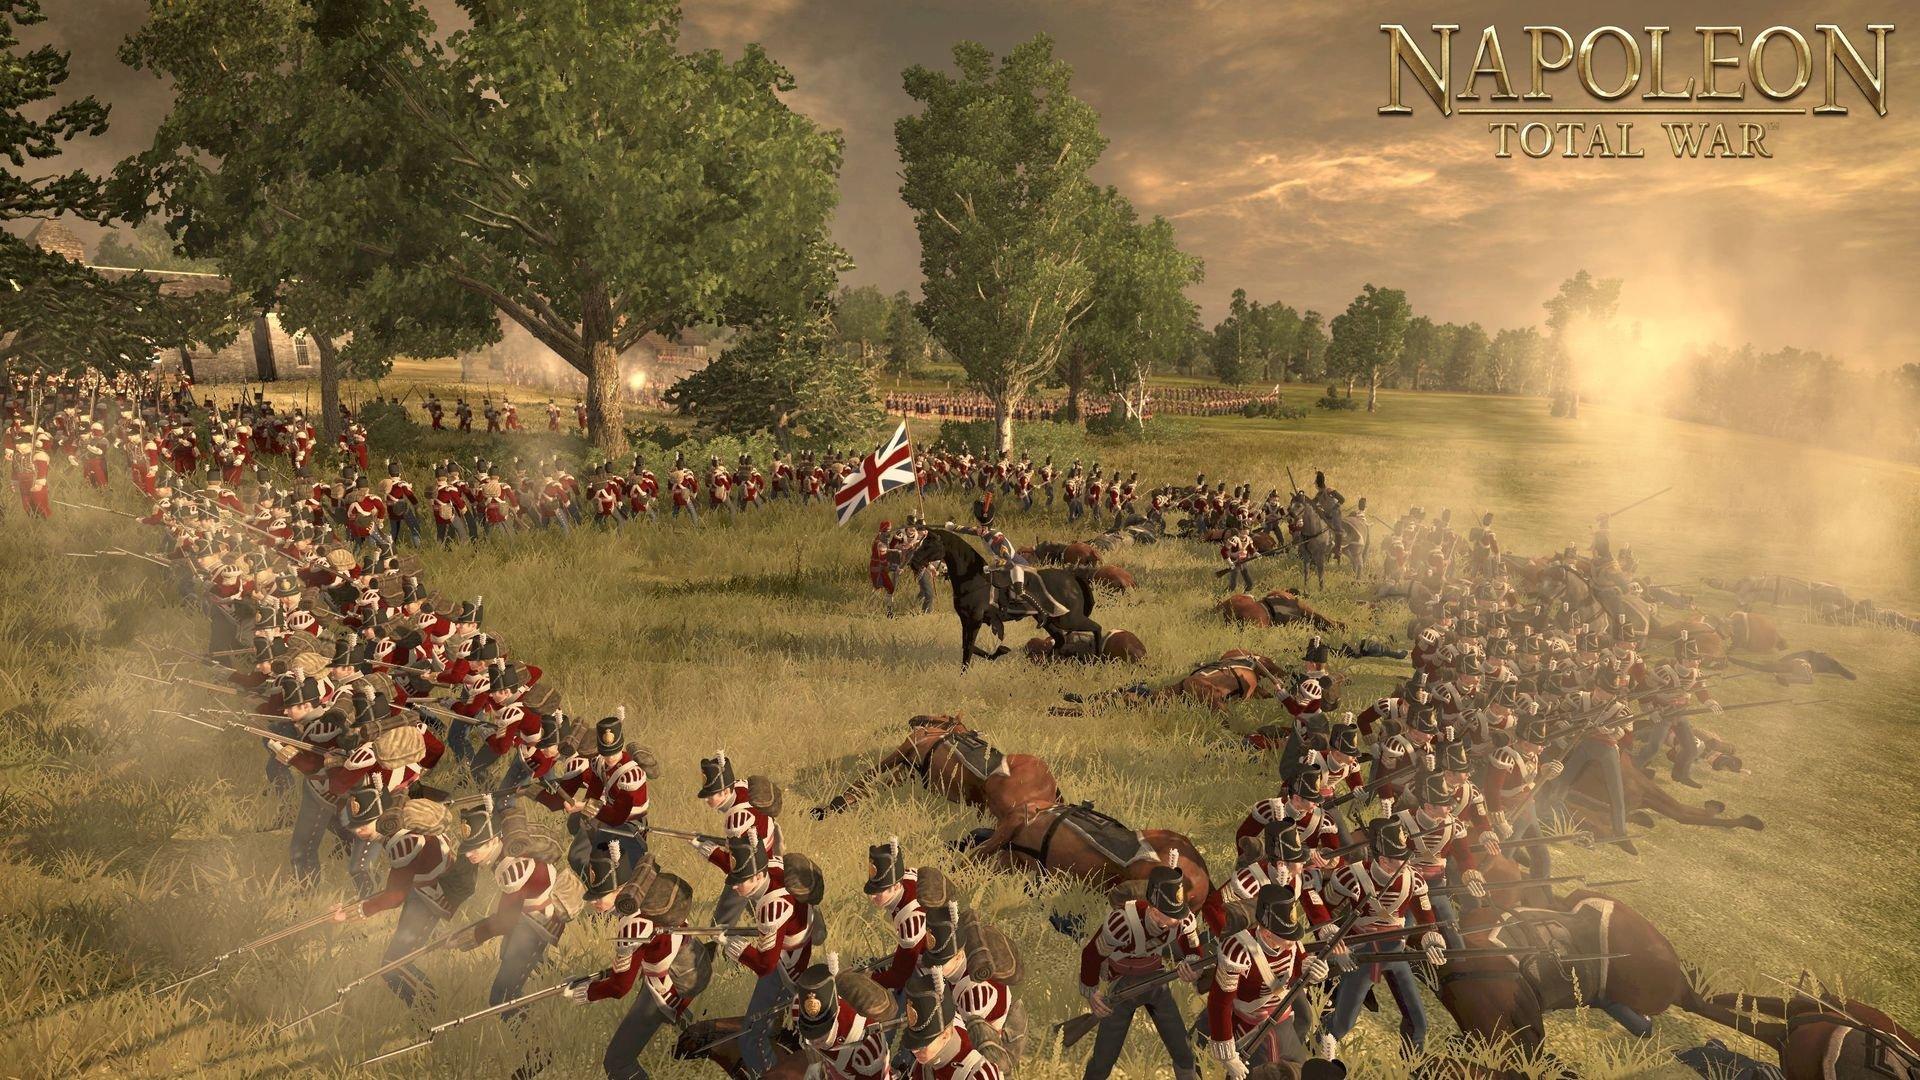 Total War Hd Wallpaper Total War Napoleon 1494050 Hd